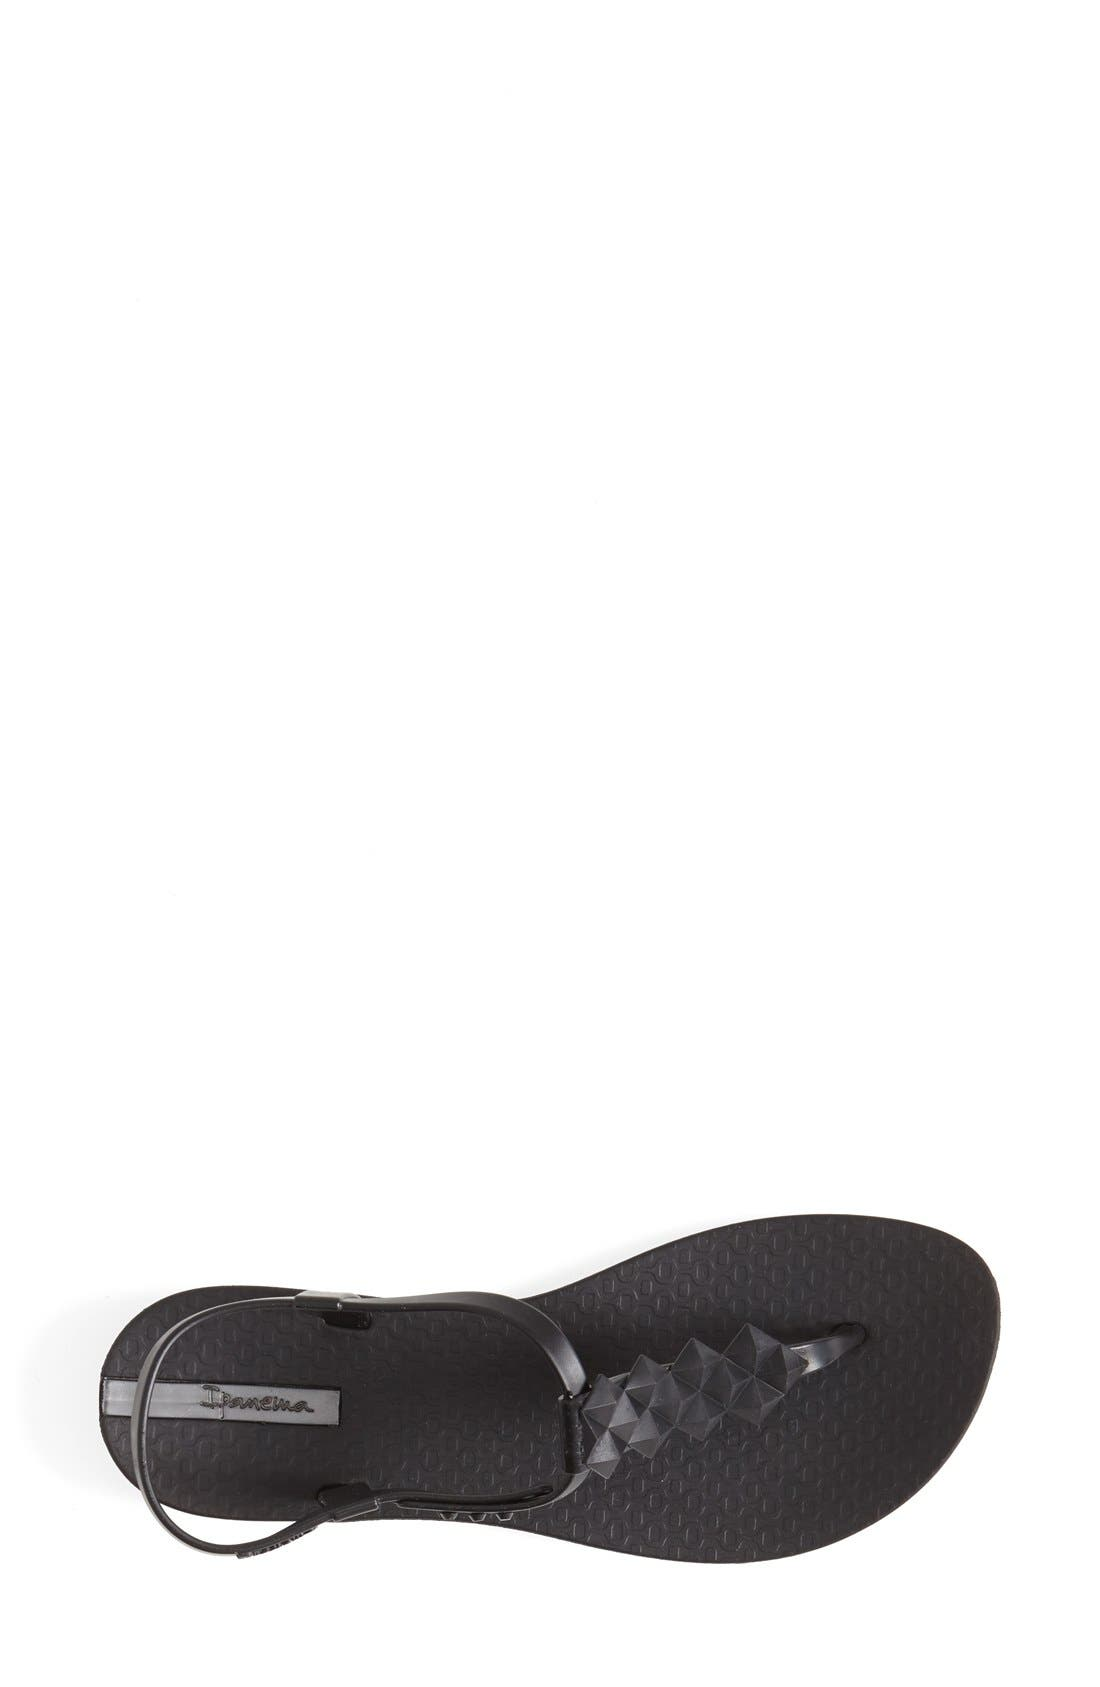 'Cleo' Pyramid Stud Ankle Strap Flip Flop,                             Alternate thumbnail 3, color,                             Black